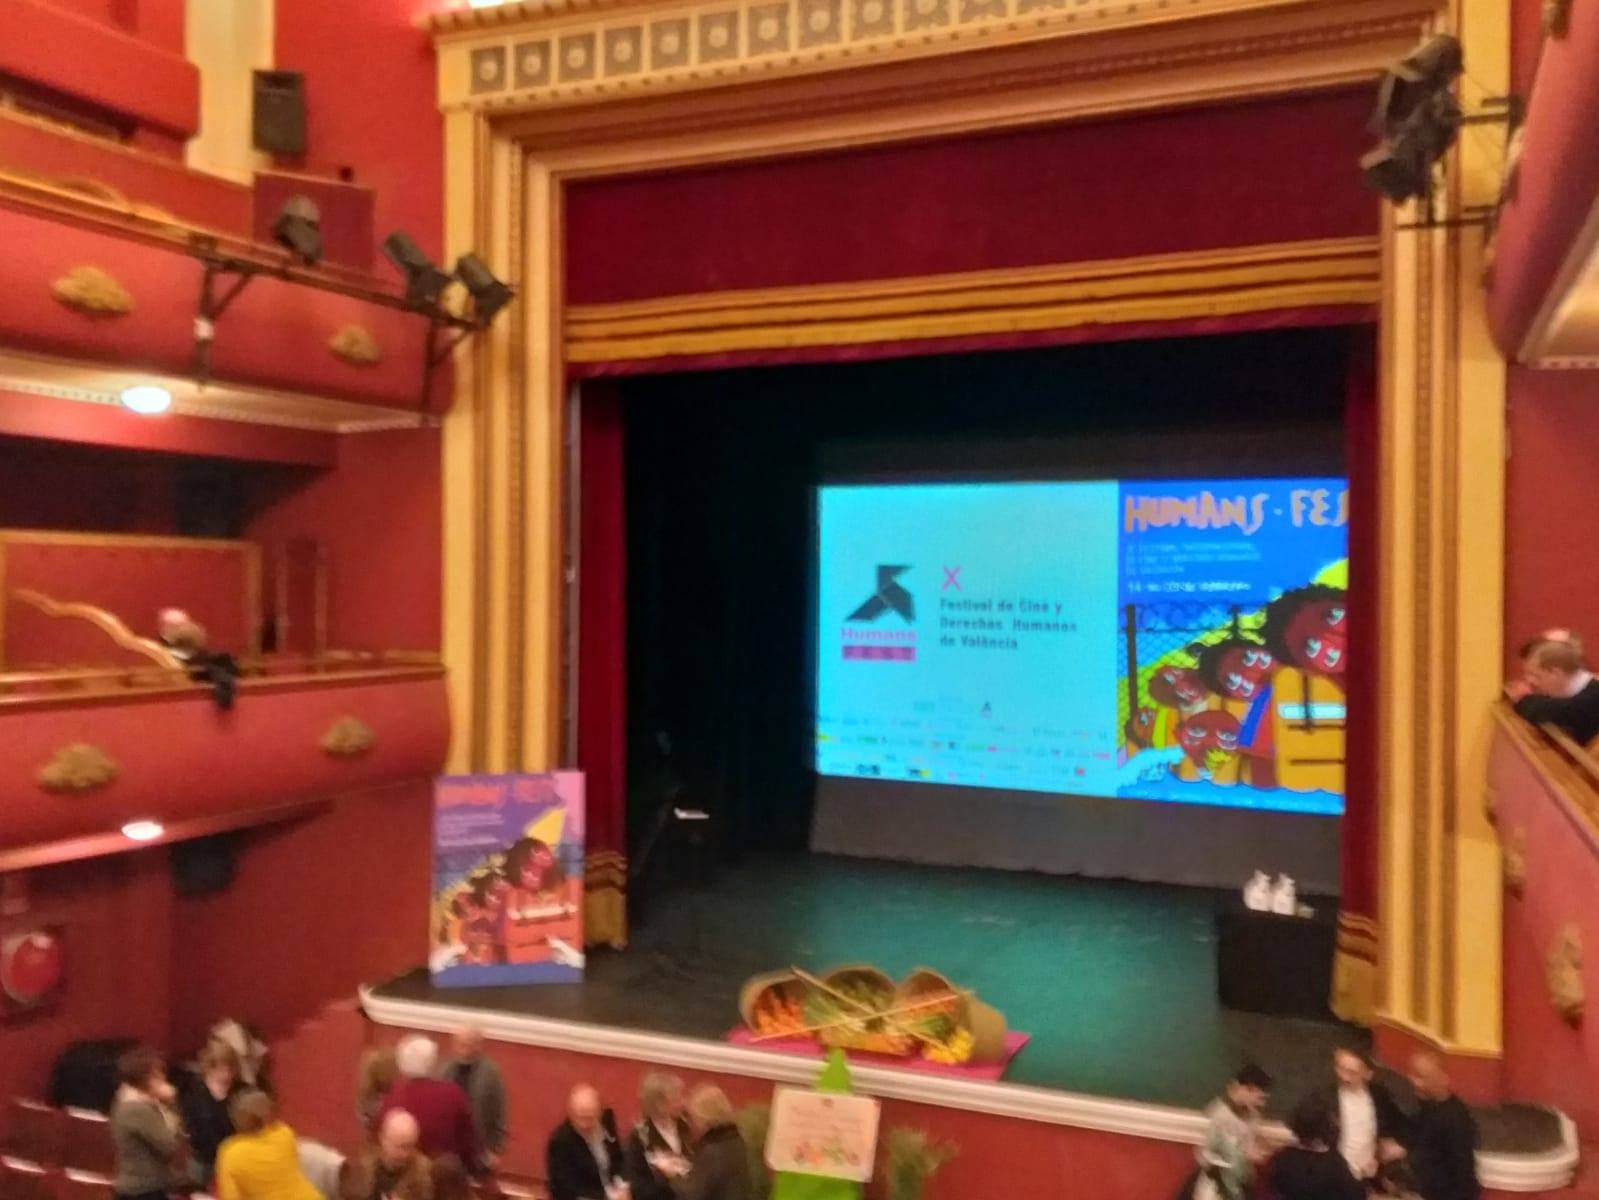 Festival de Cinema i Drets Humans - Human Fest